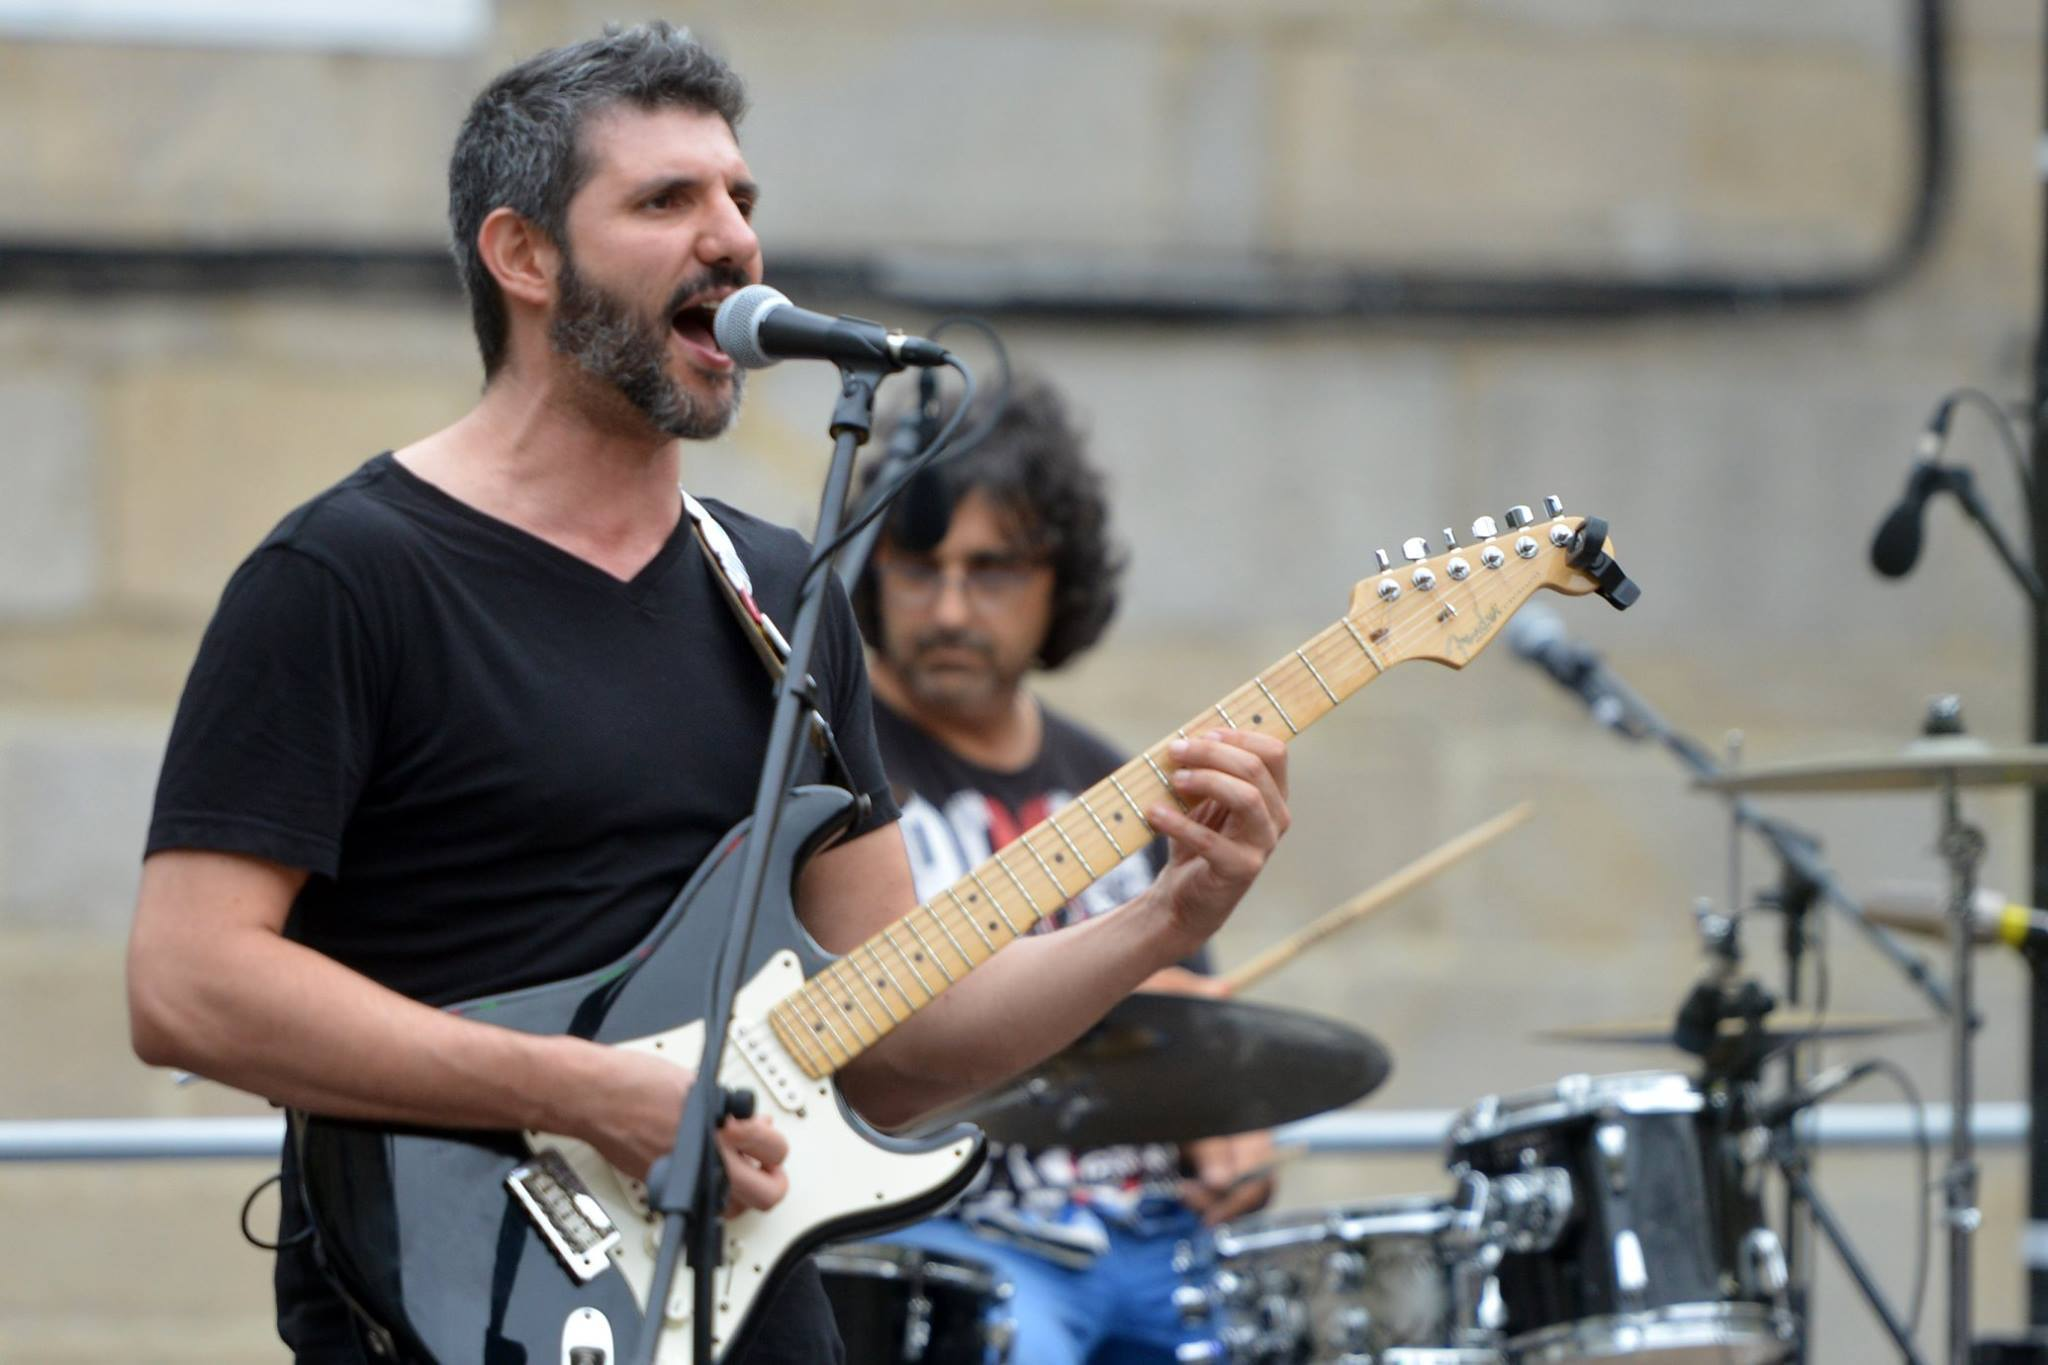 Juan Pablo Charlo